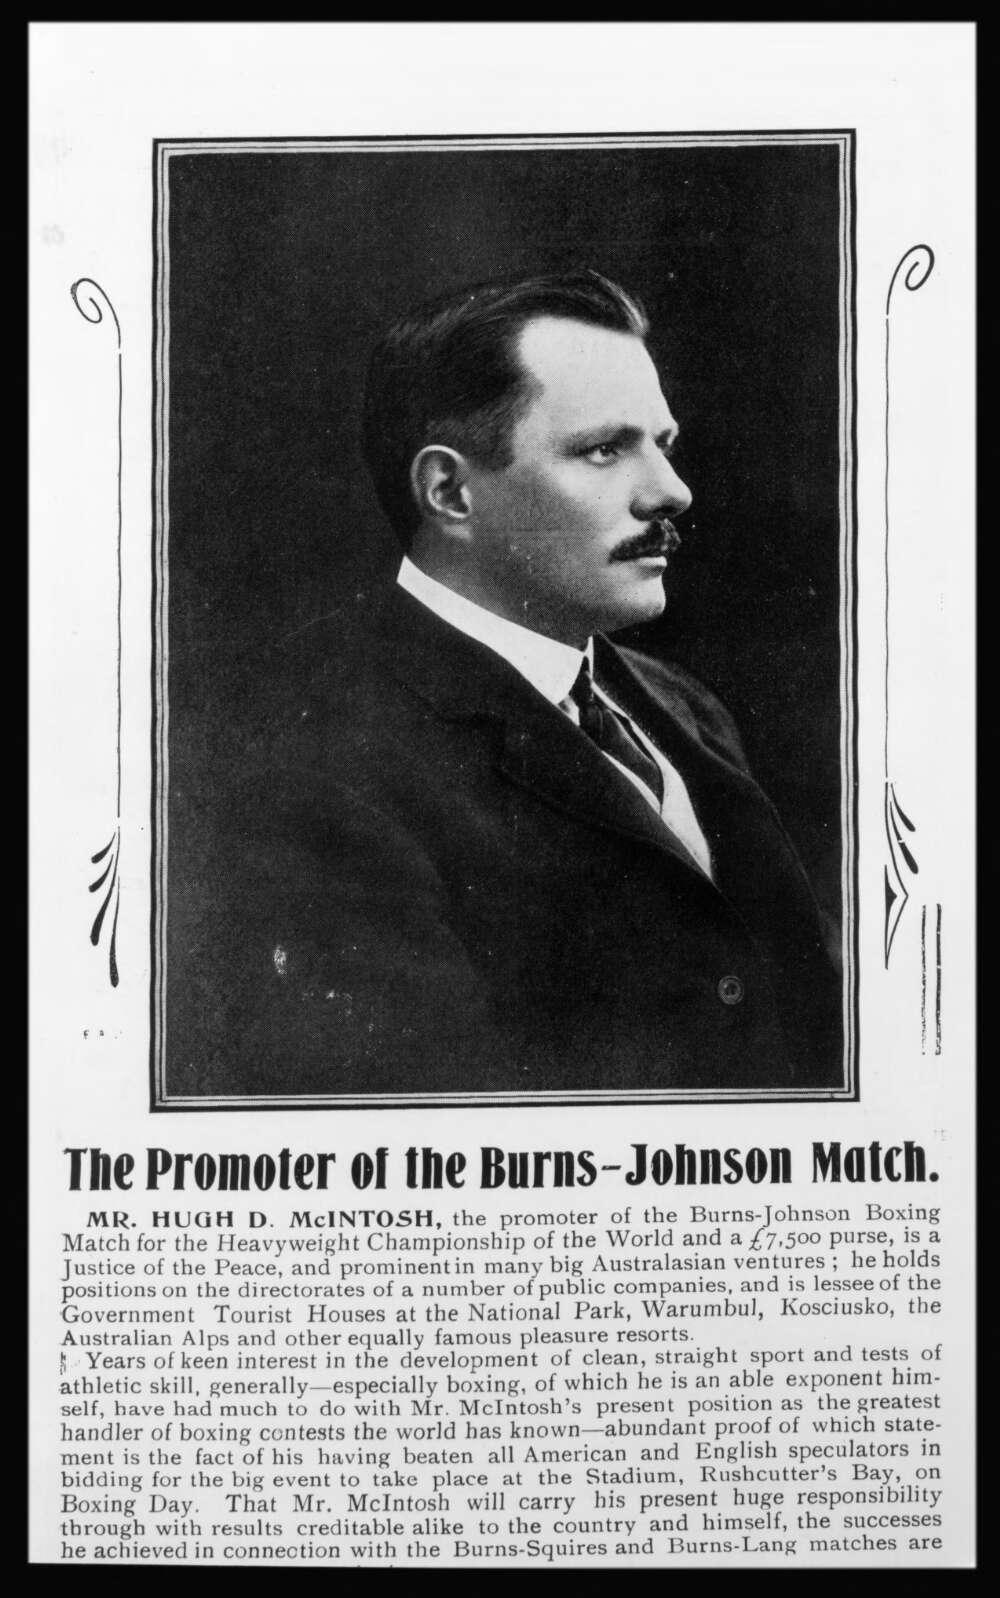 Hugh D Macintosh, promoter of the Burns-Johnson match